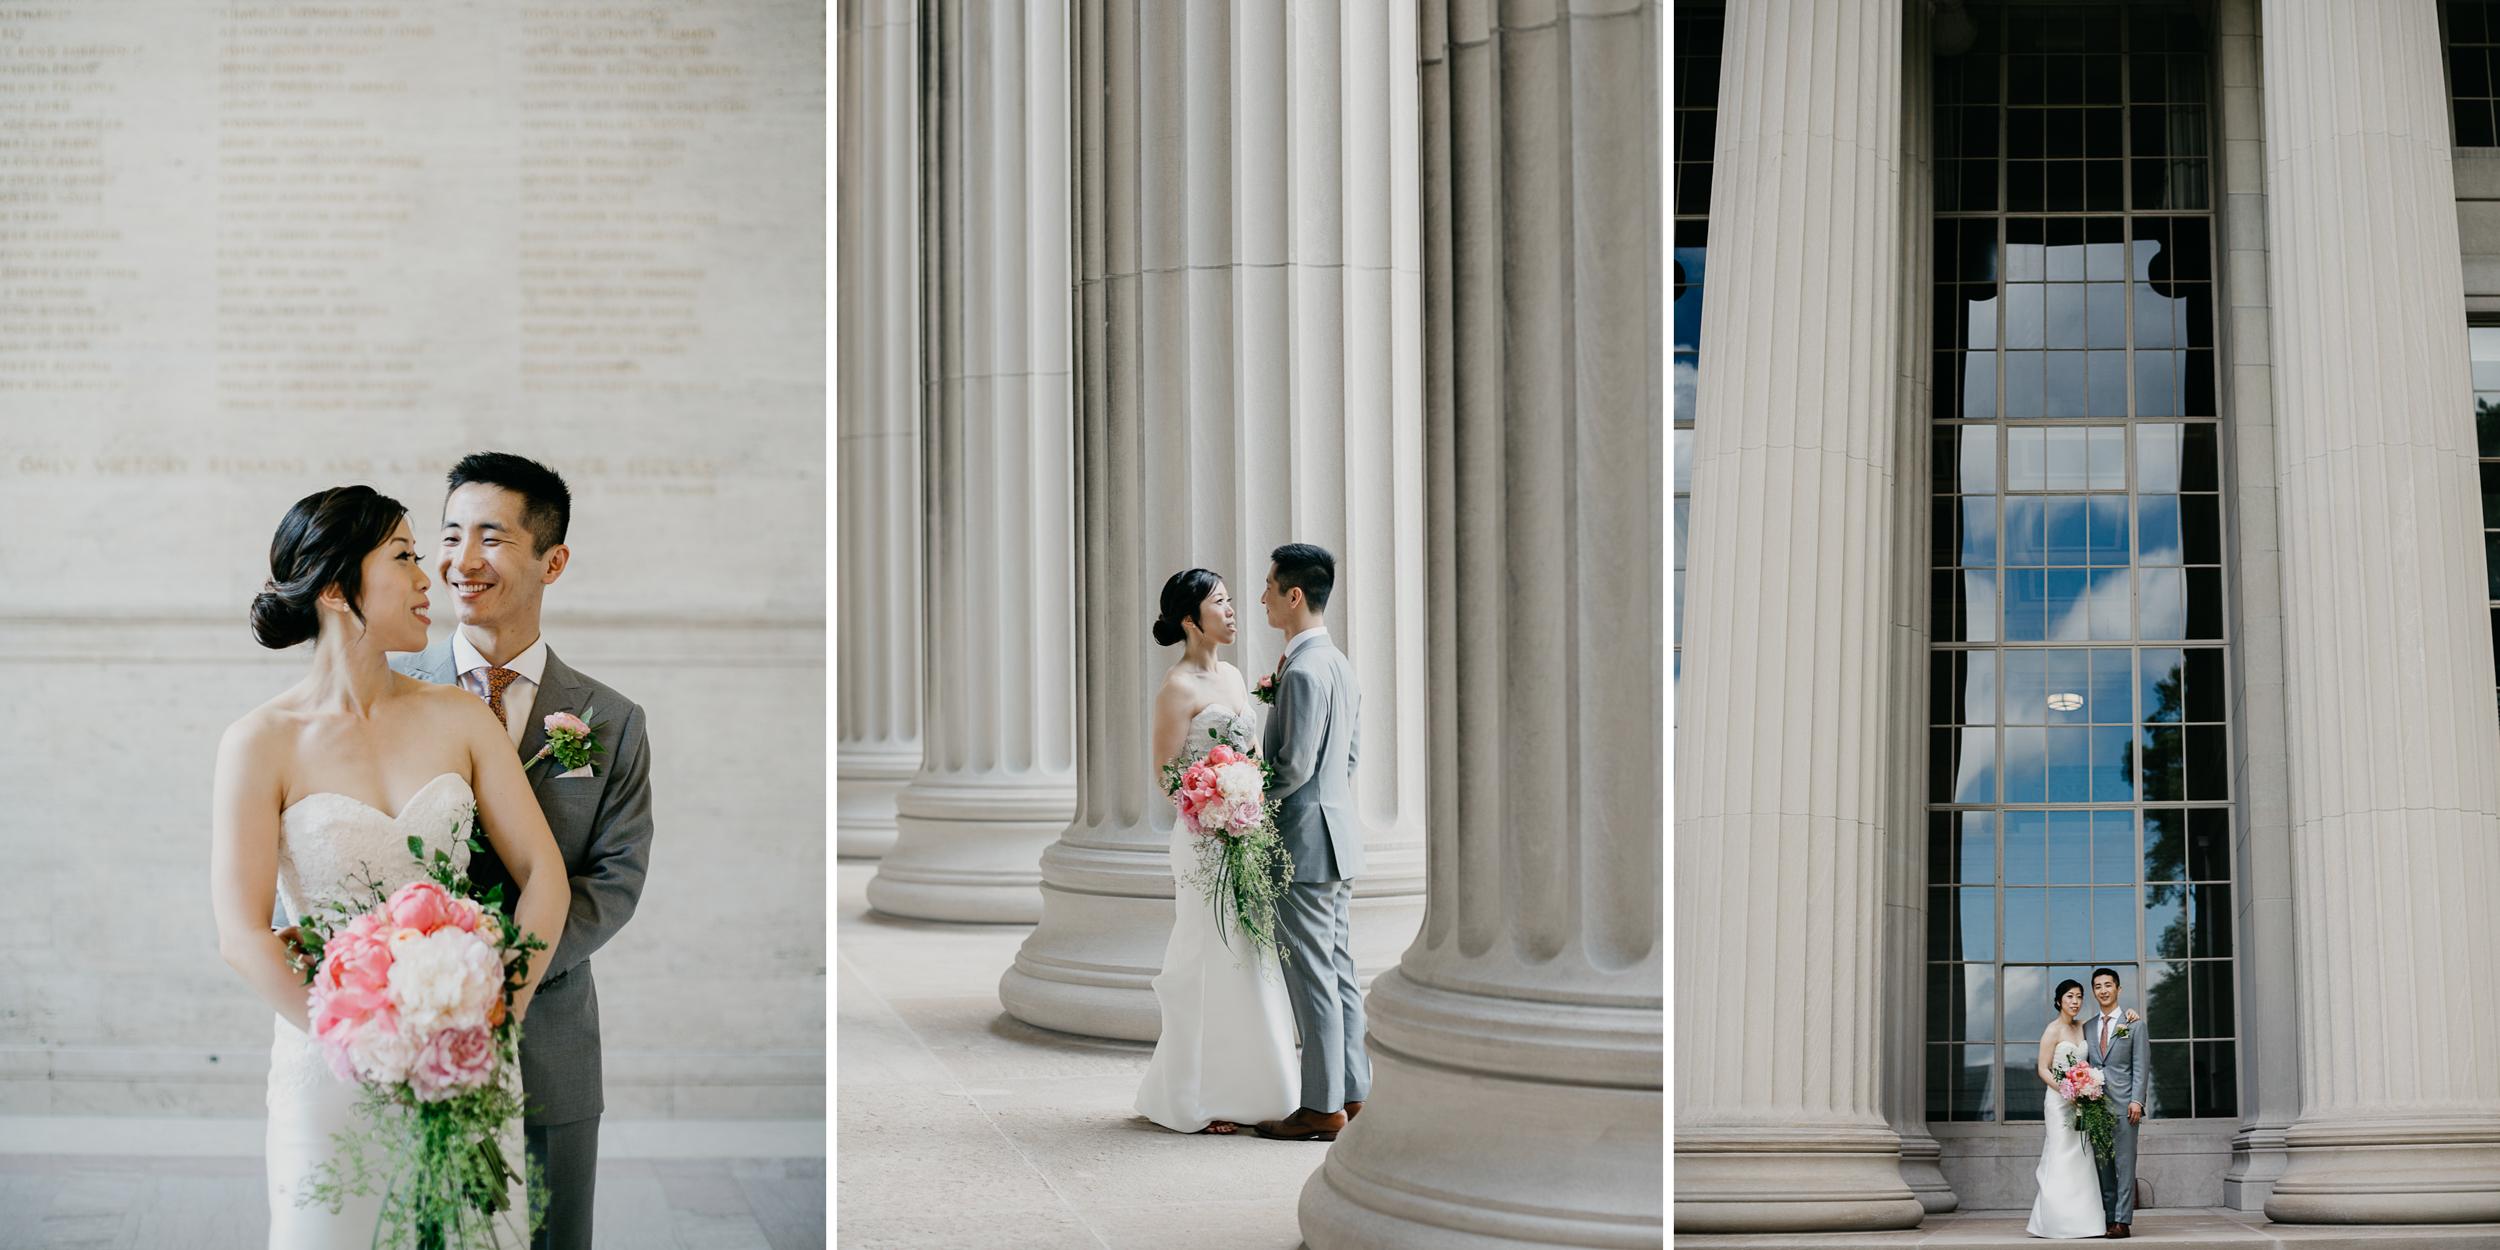 Mindy_Bo_Boston_Wedding_MIT_HotelCommonwealth_010.jpg